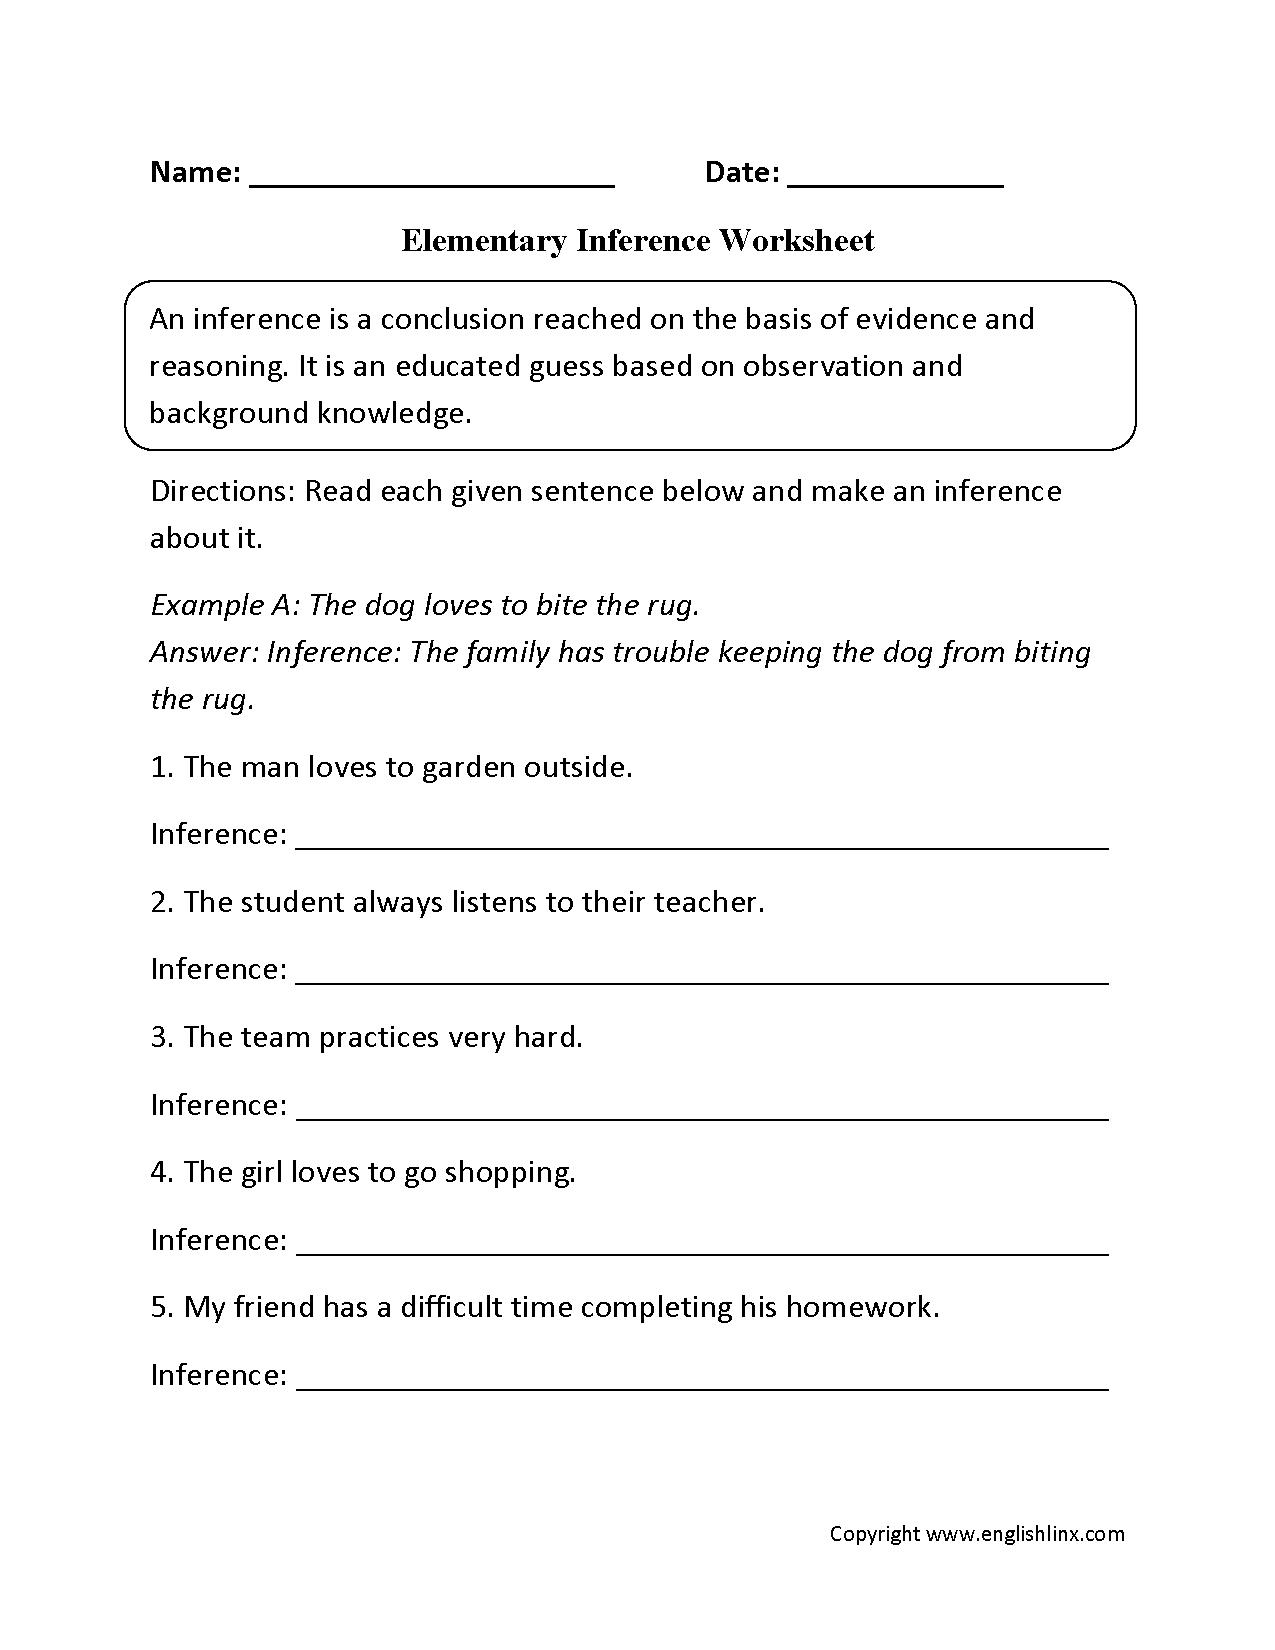 Grade 4 Health Worksheets and Reading Worksheets Inference Worksheets